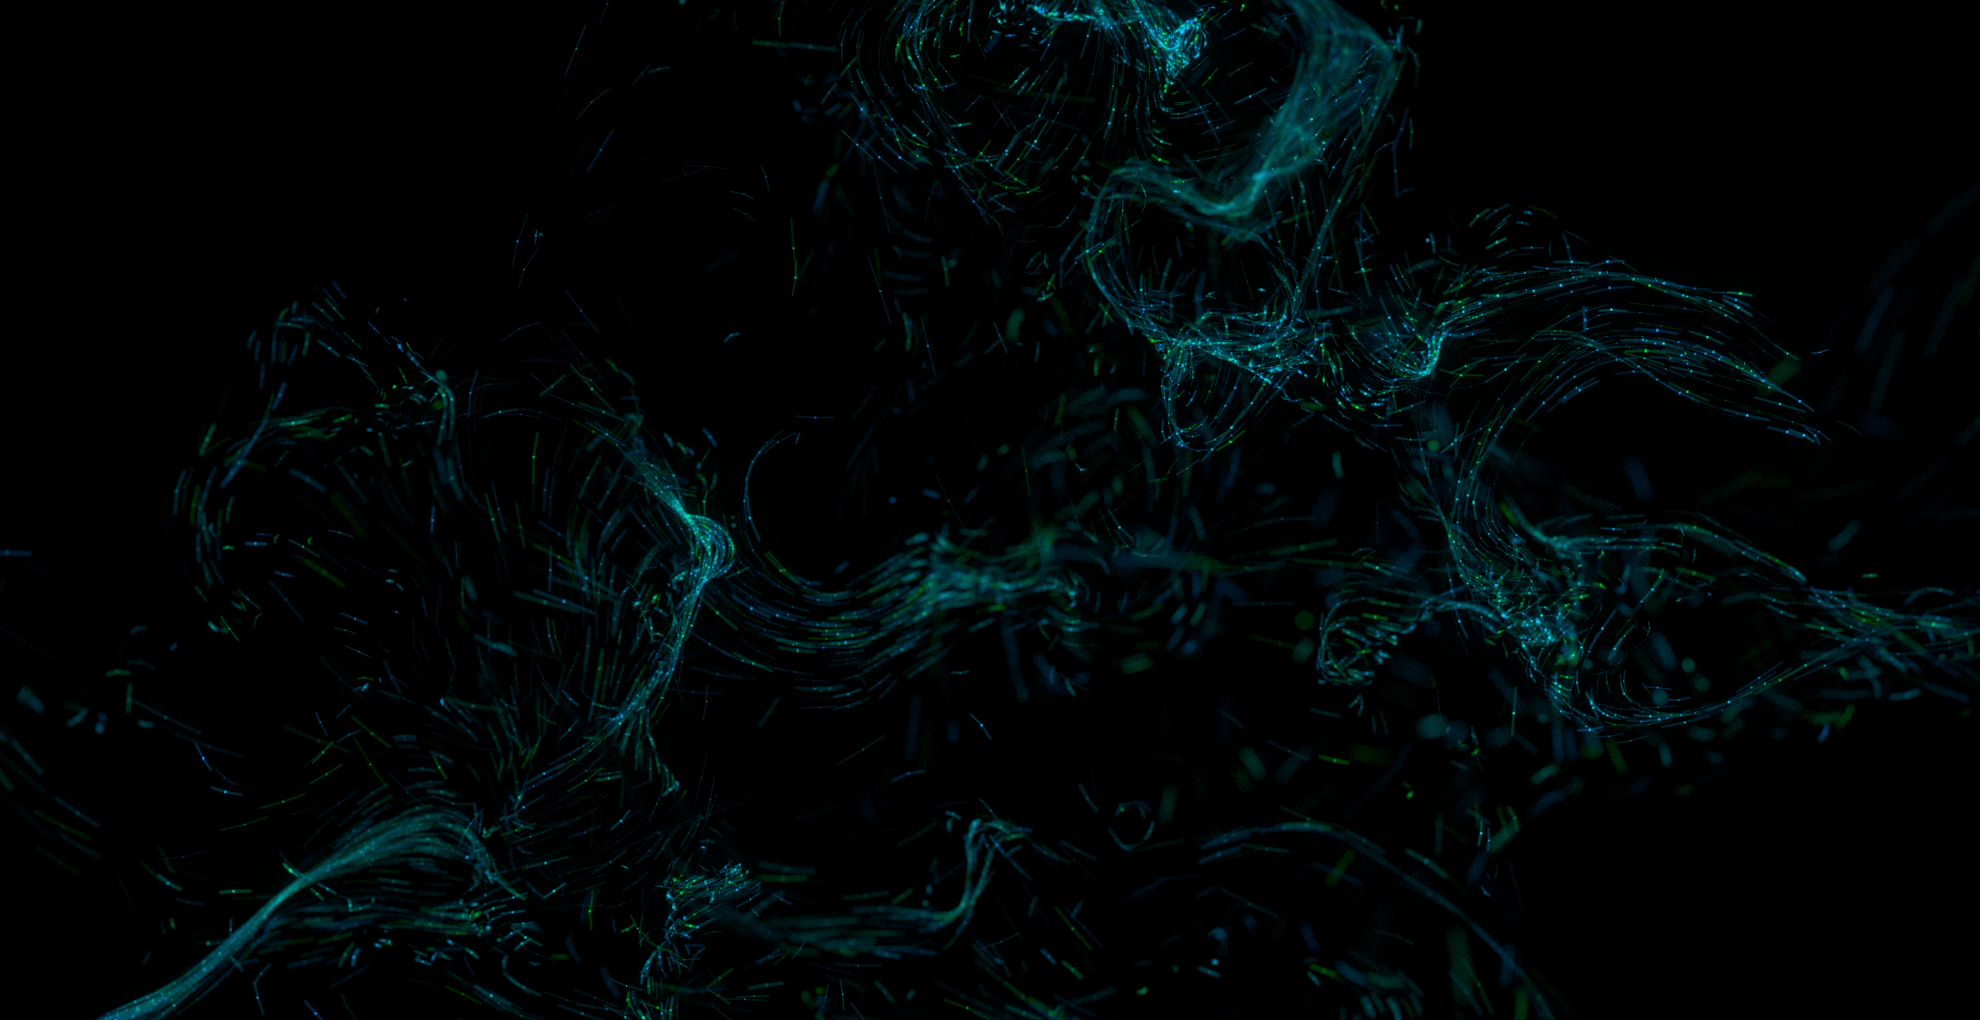 Dark abstract background wallpapersafari - M416 wallpaper ...